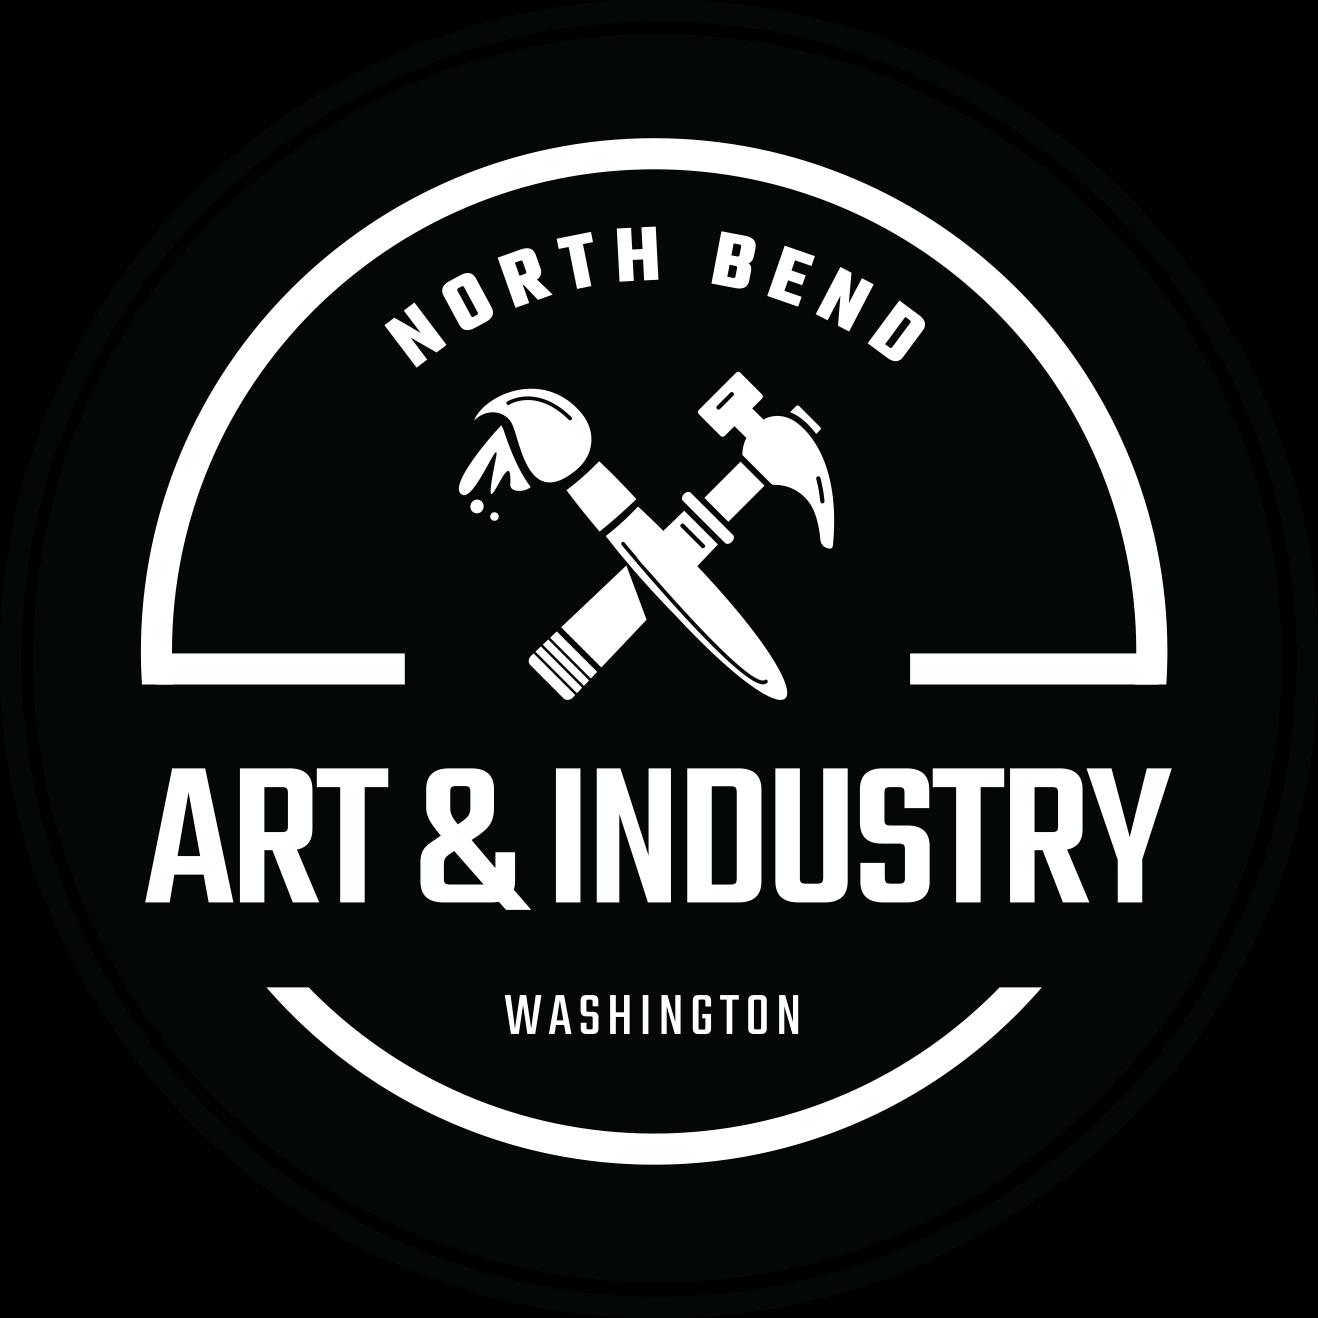 North Bend Art & Industry